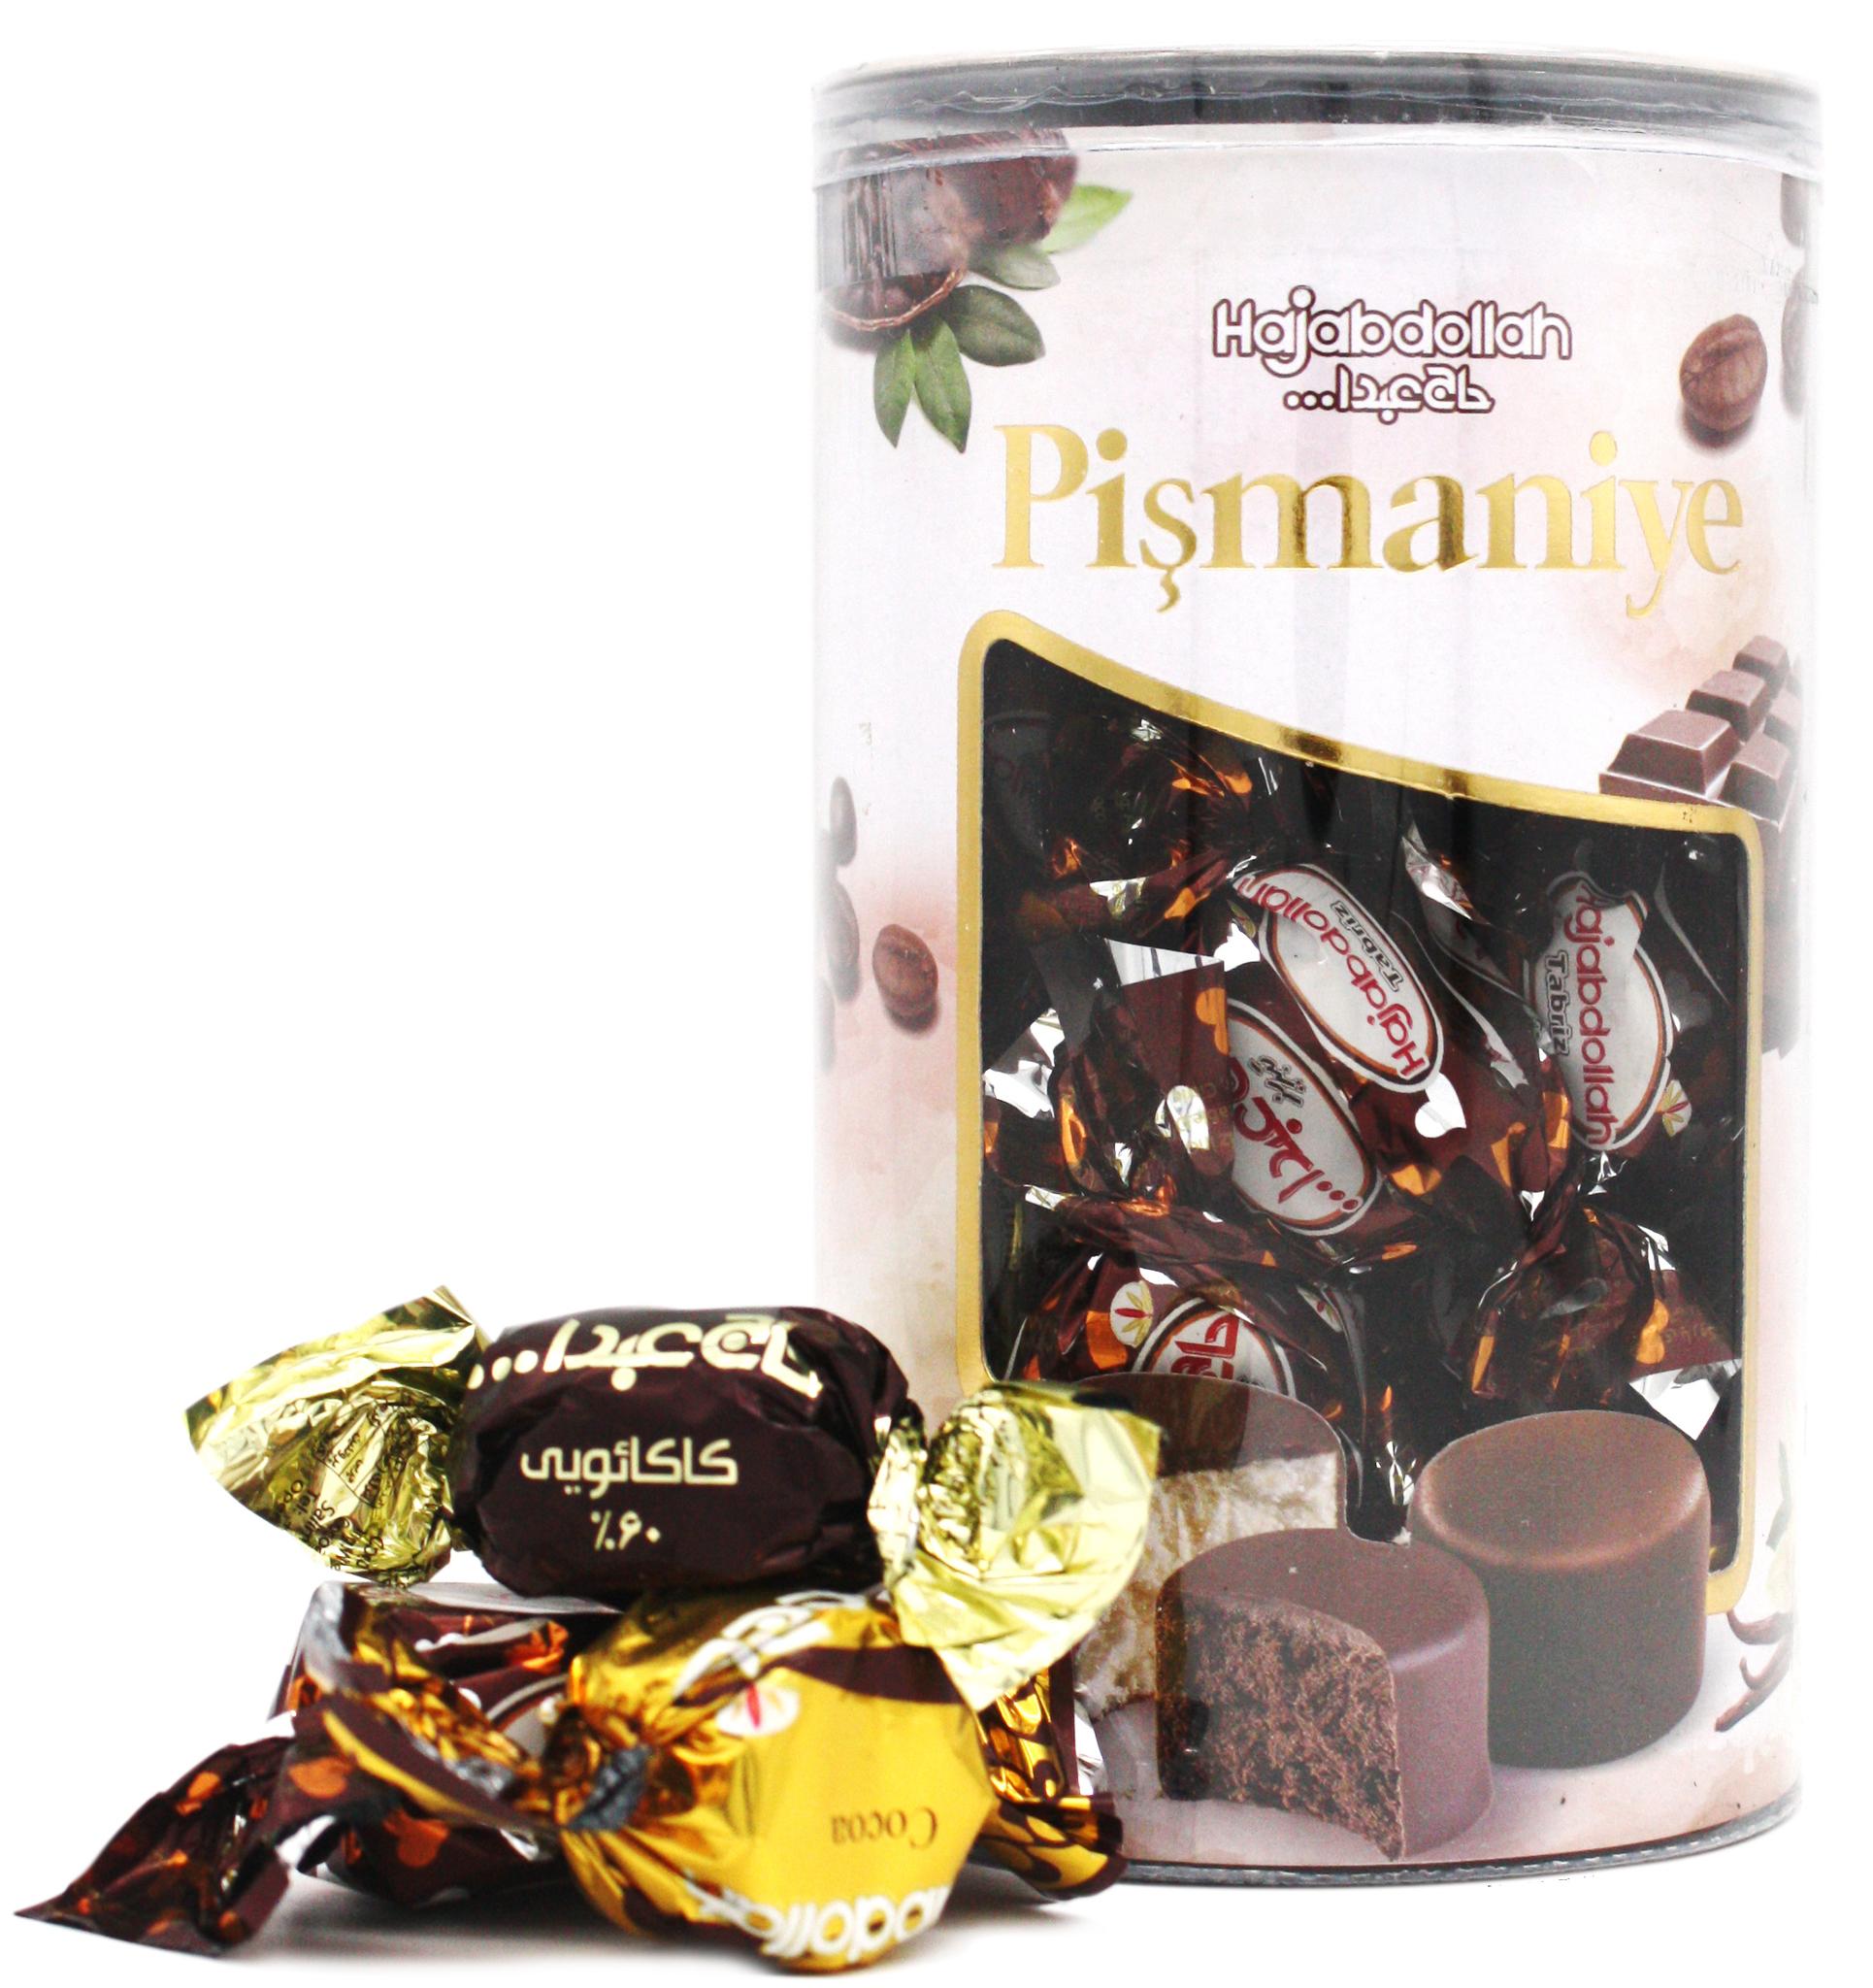 "Hajabdollah Пишмание со вкусом горького шоколада, ванили и кофе ""Шоколадное ассорти"", Hajabdollah, 200 г import_files_26_26fe9fd2c9a011e9a9b3484d7ecee297_0a48d7dcd46611e9a9b5484d7ecee297.jpg"